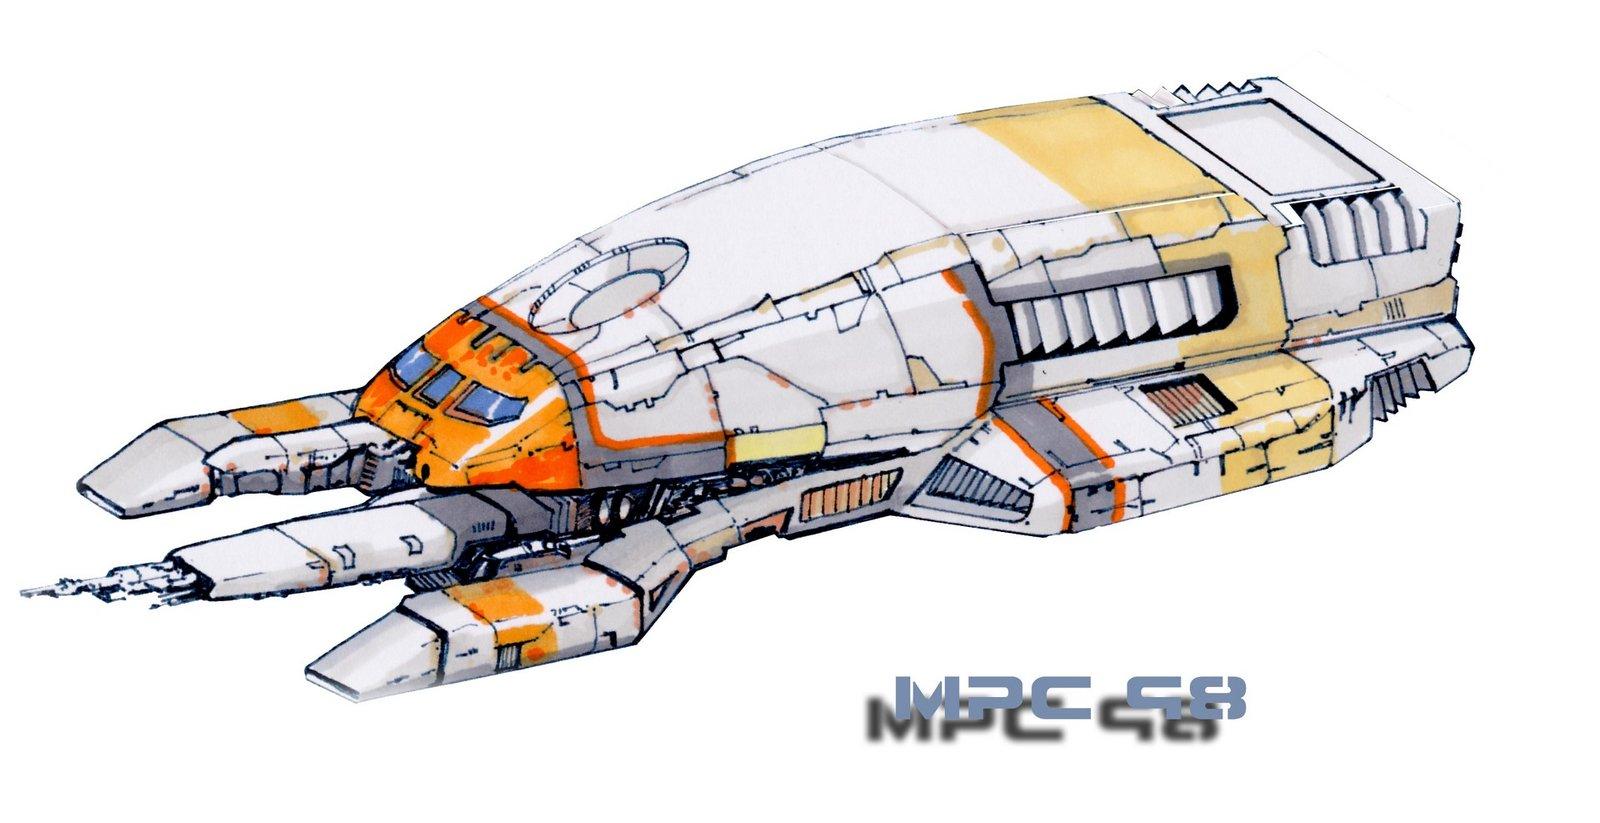 MPC SHUTTLE 991